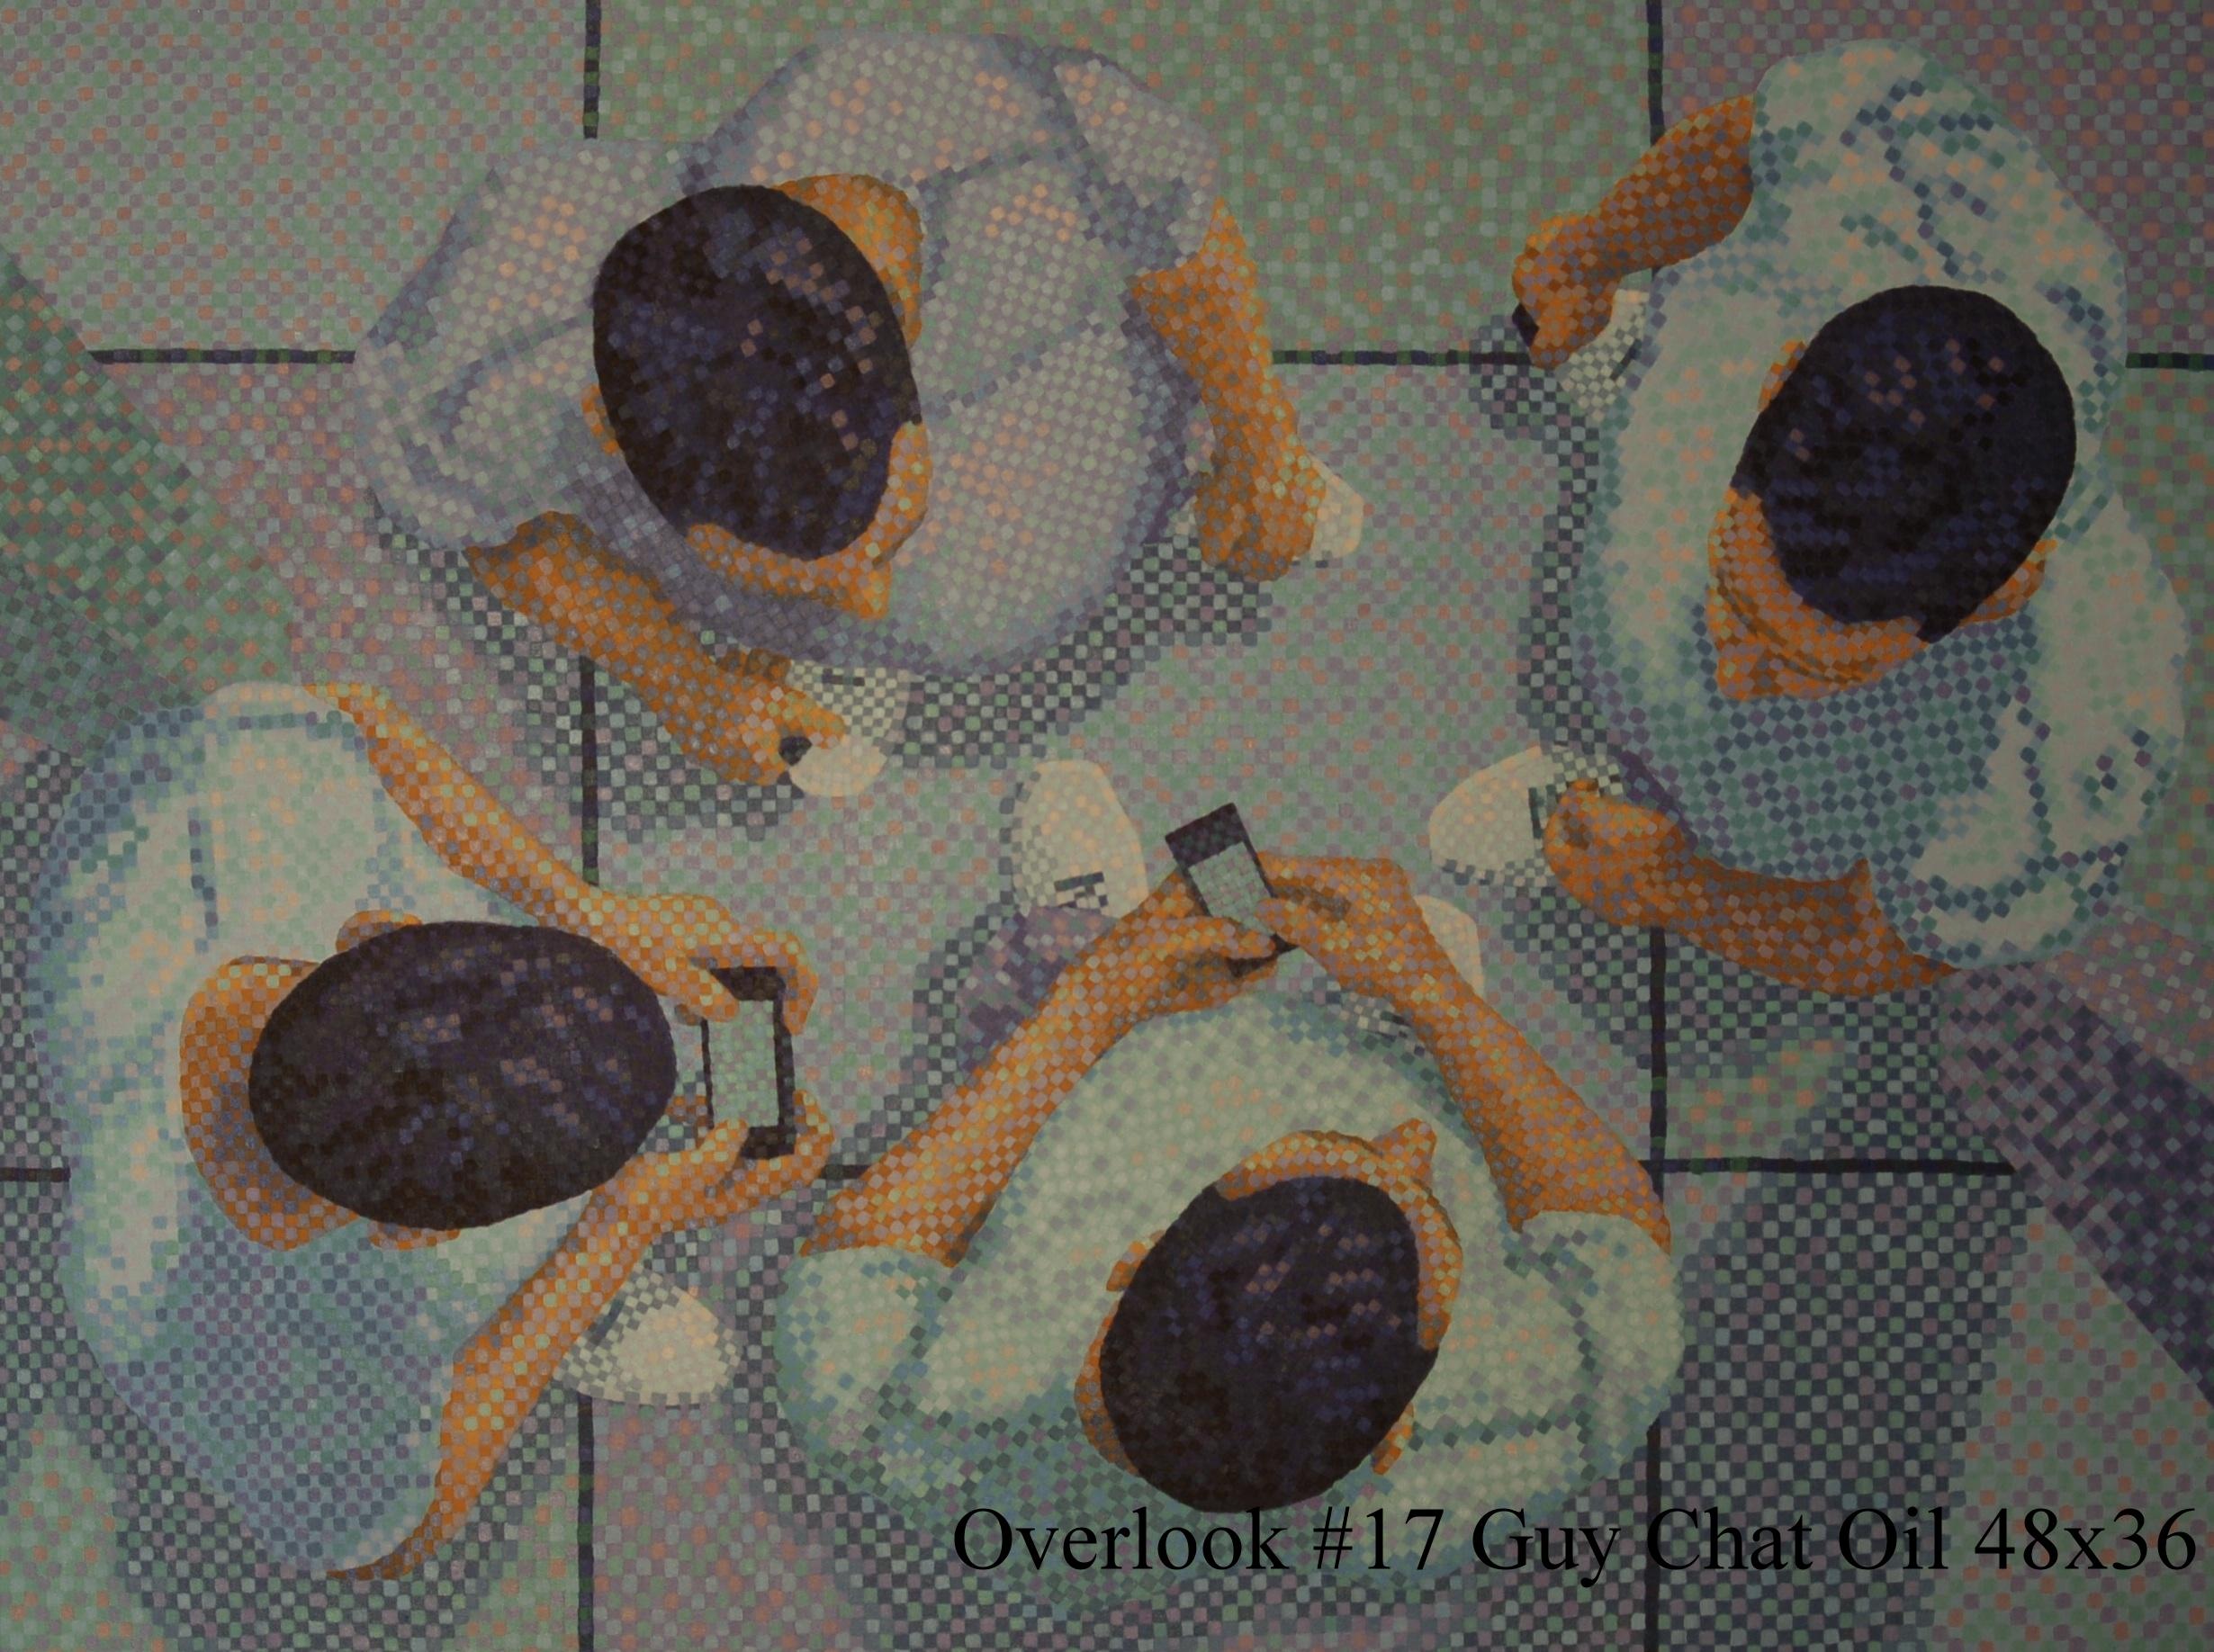 Overlook #17 Guy Chat view 1.jpg